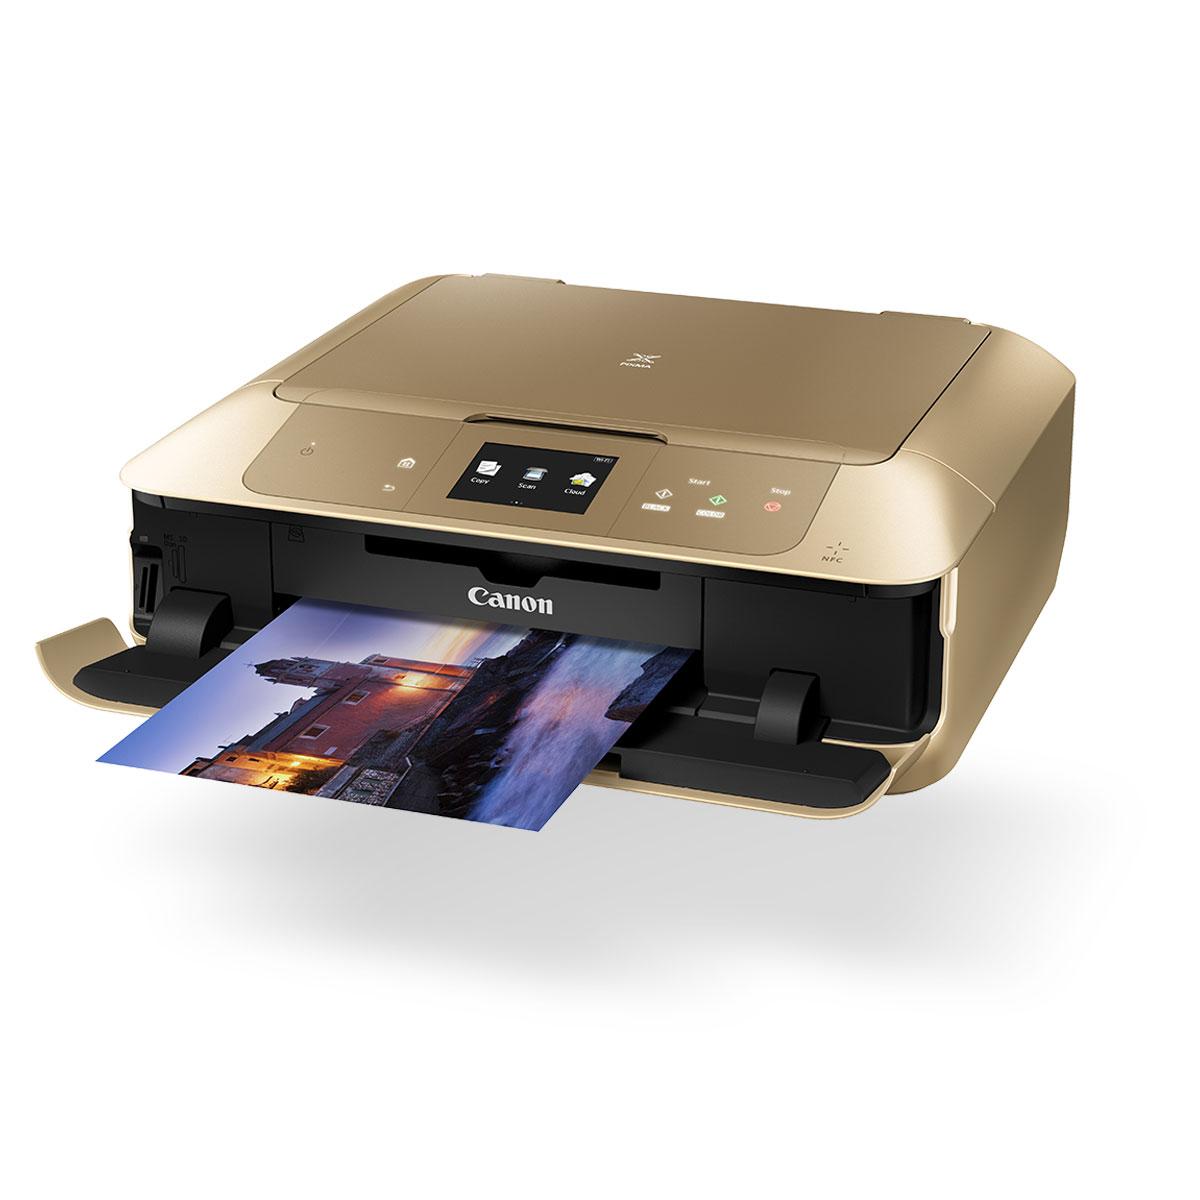 Gold PIXMA printer with print